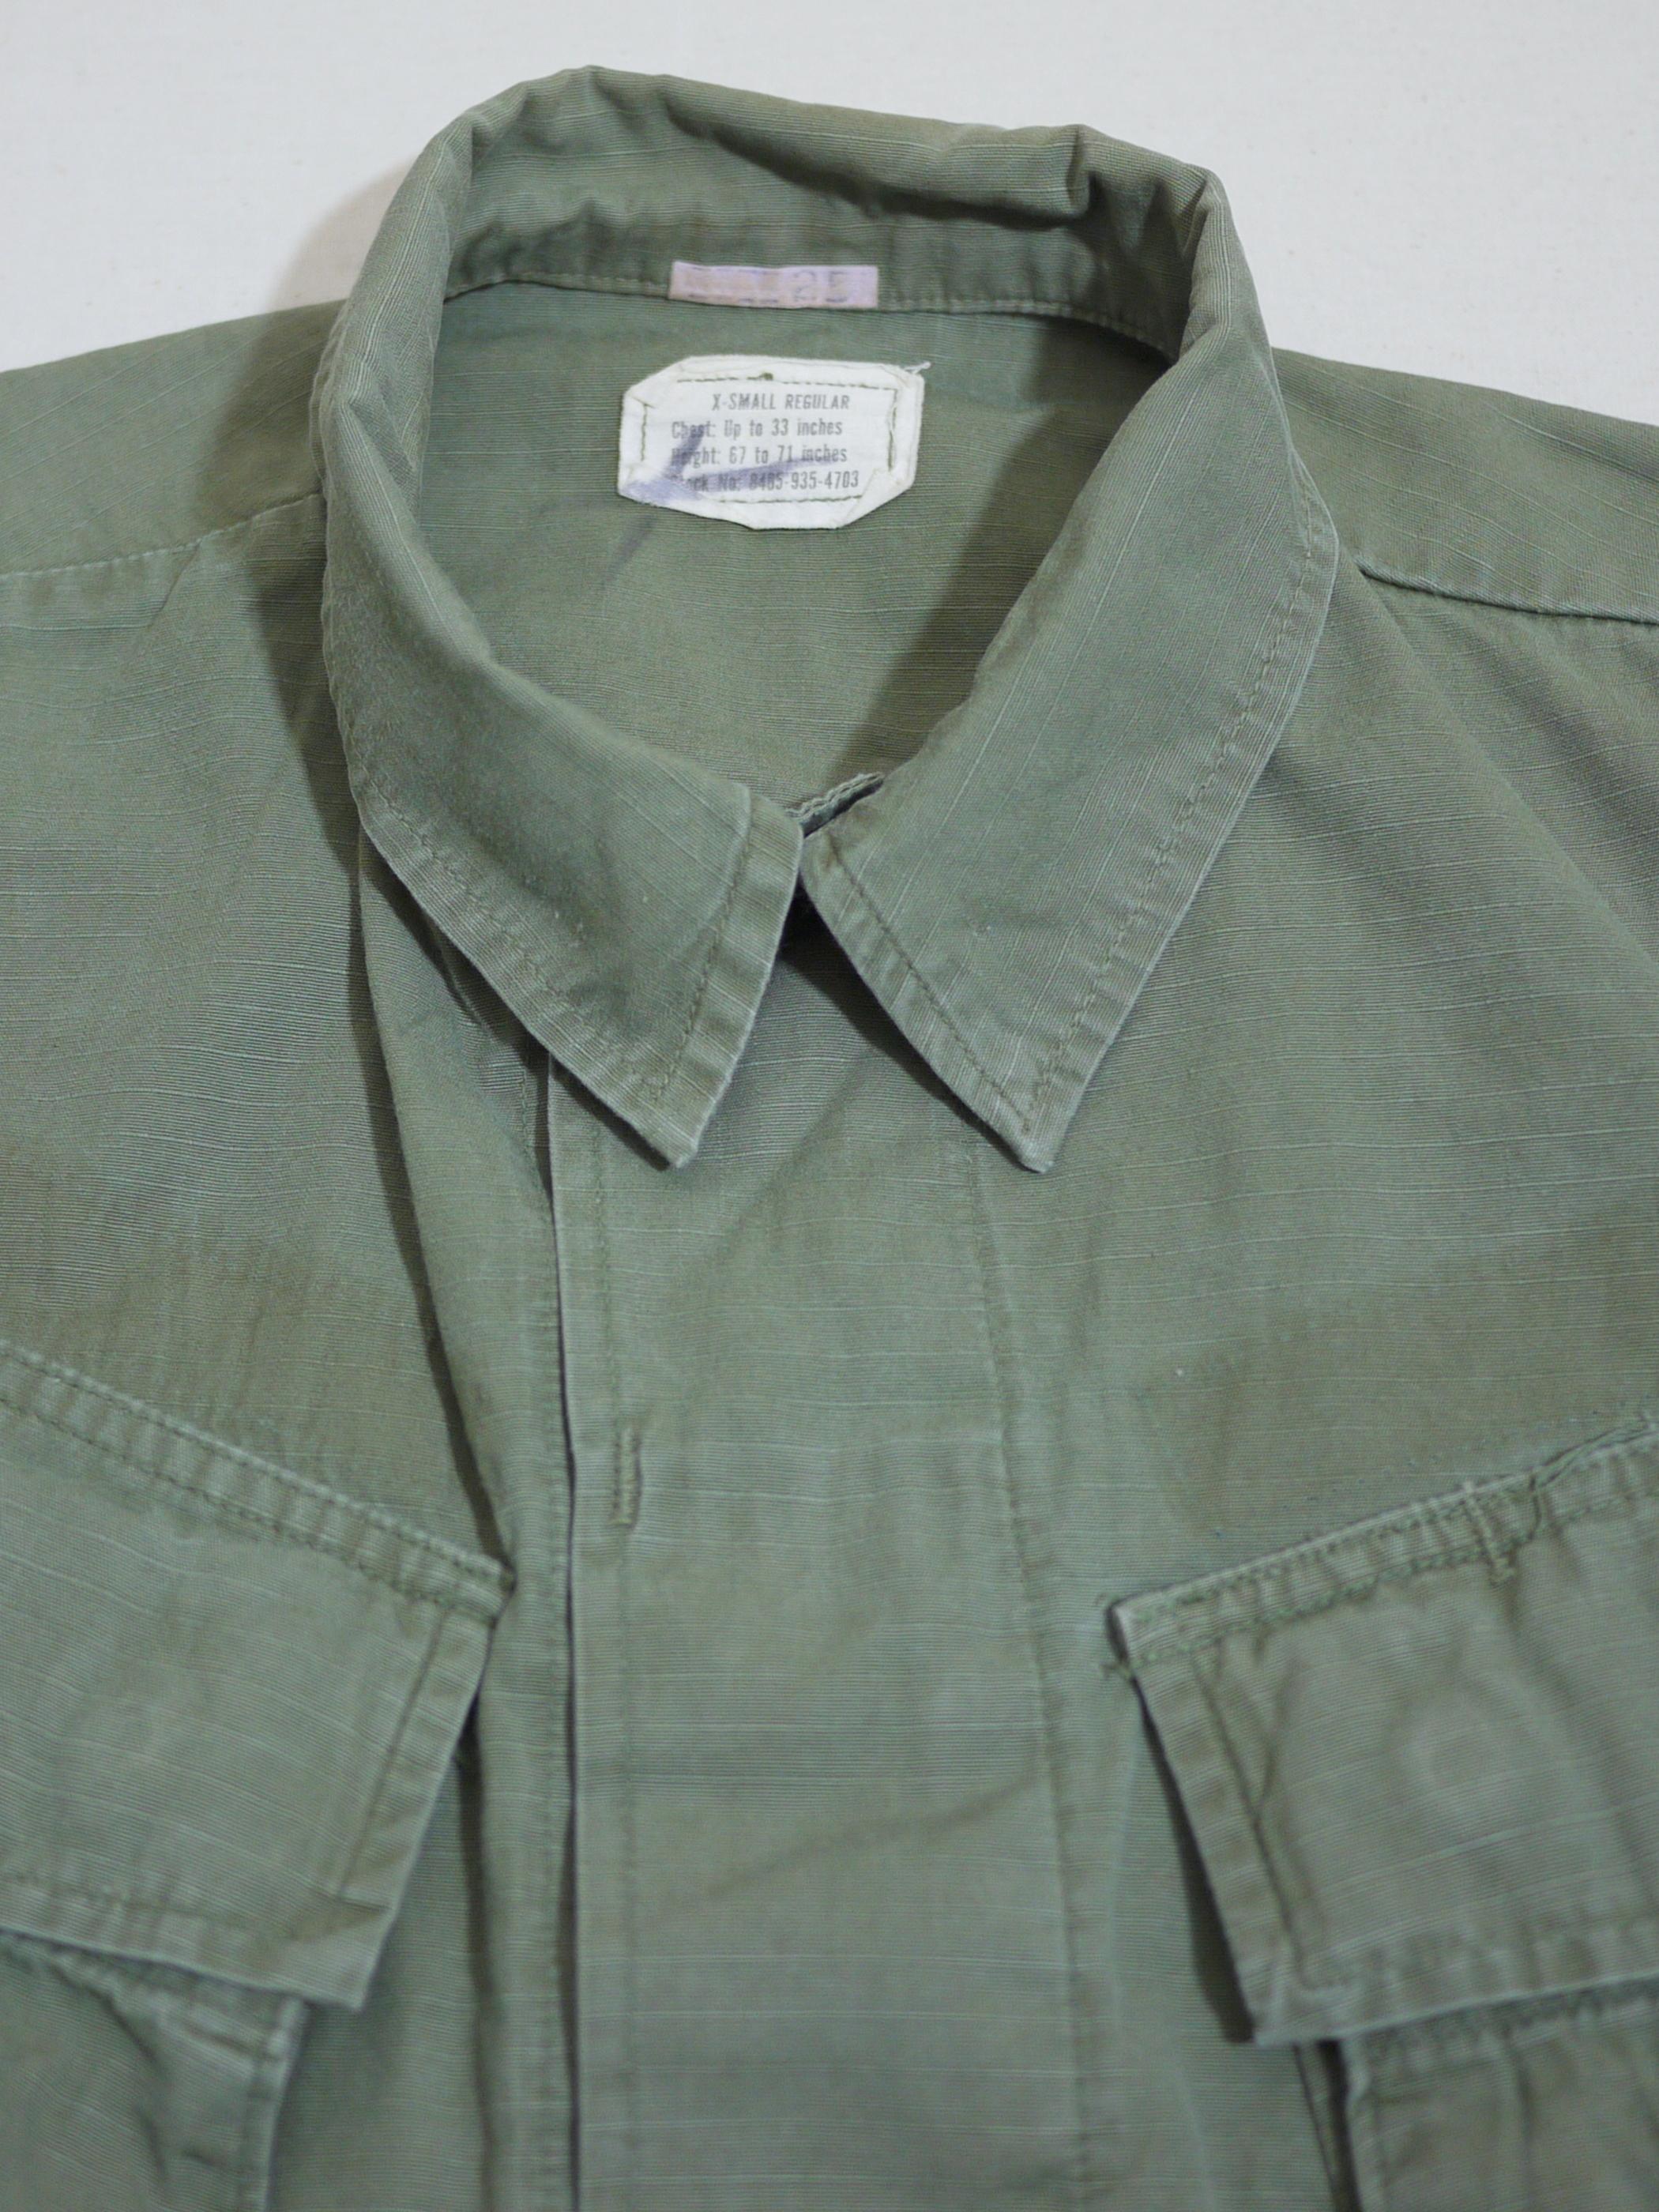 U.S.Military 1960's Fatigue Jacket SizeXS-R #4